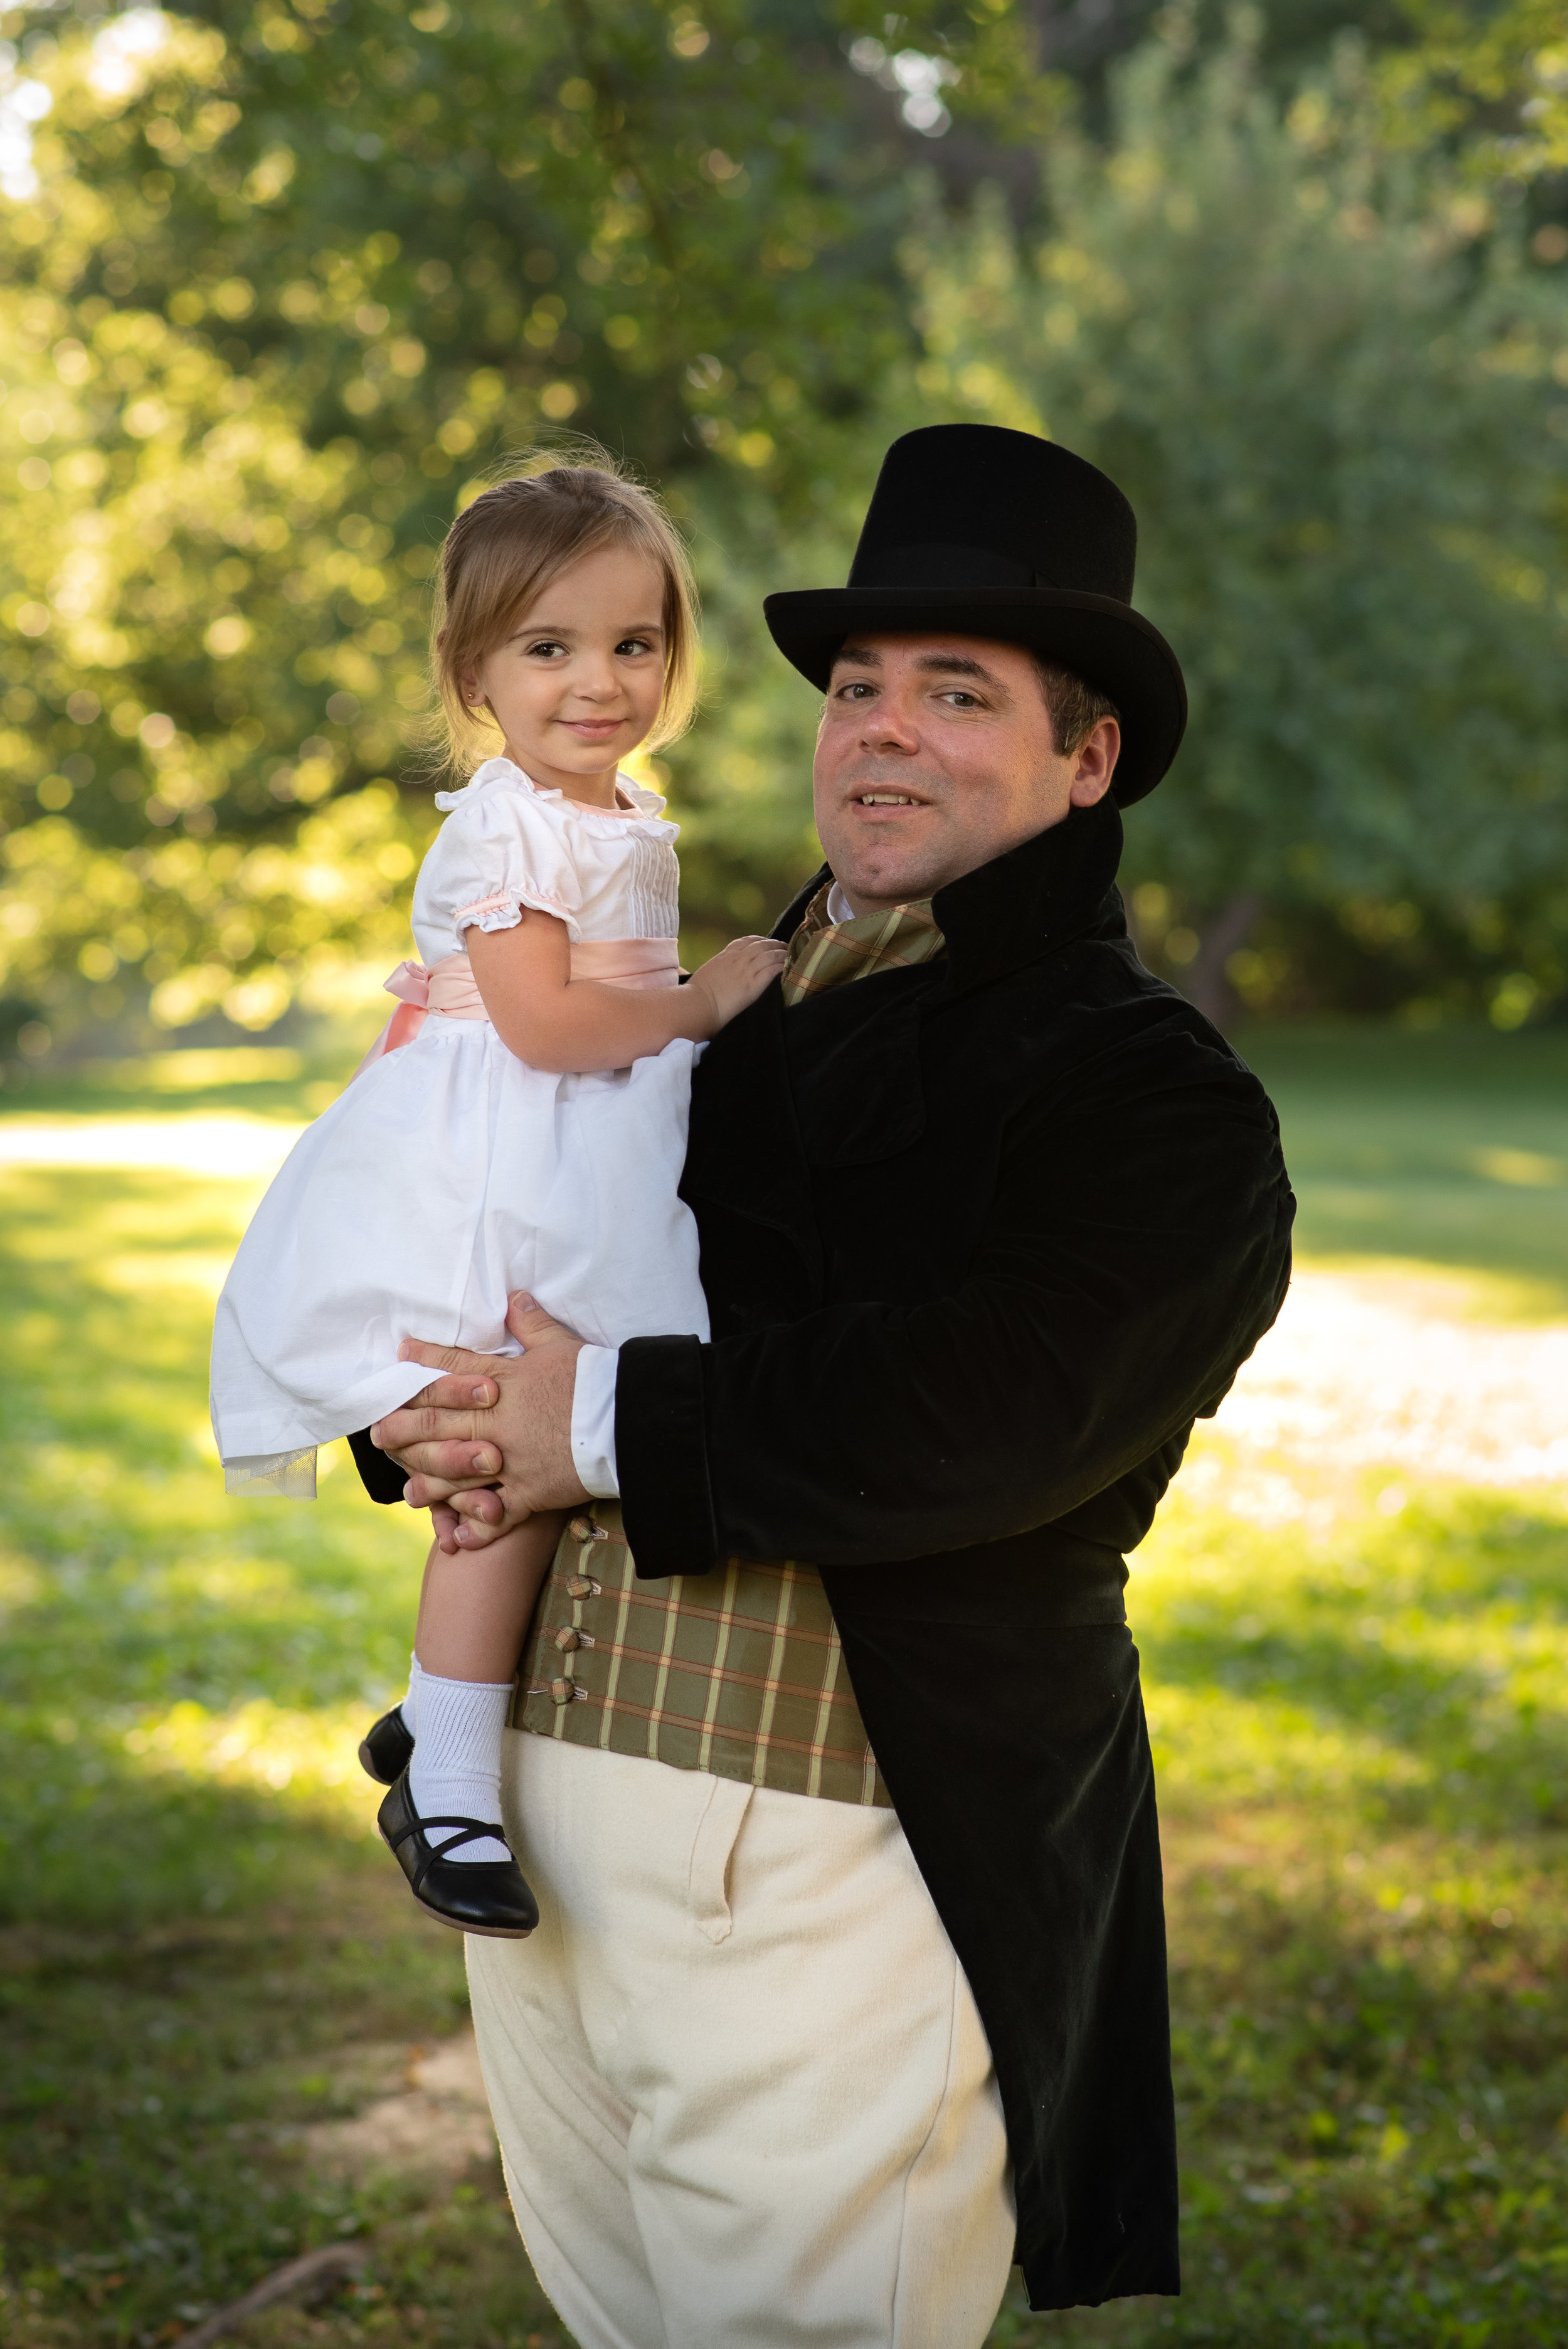 Regency Gentleman Jane Austen Festival Kentucky 2019